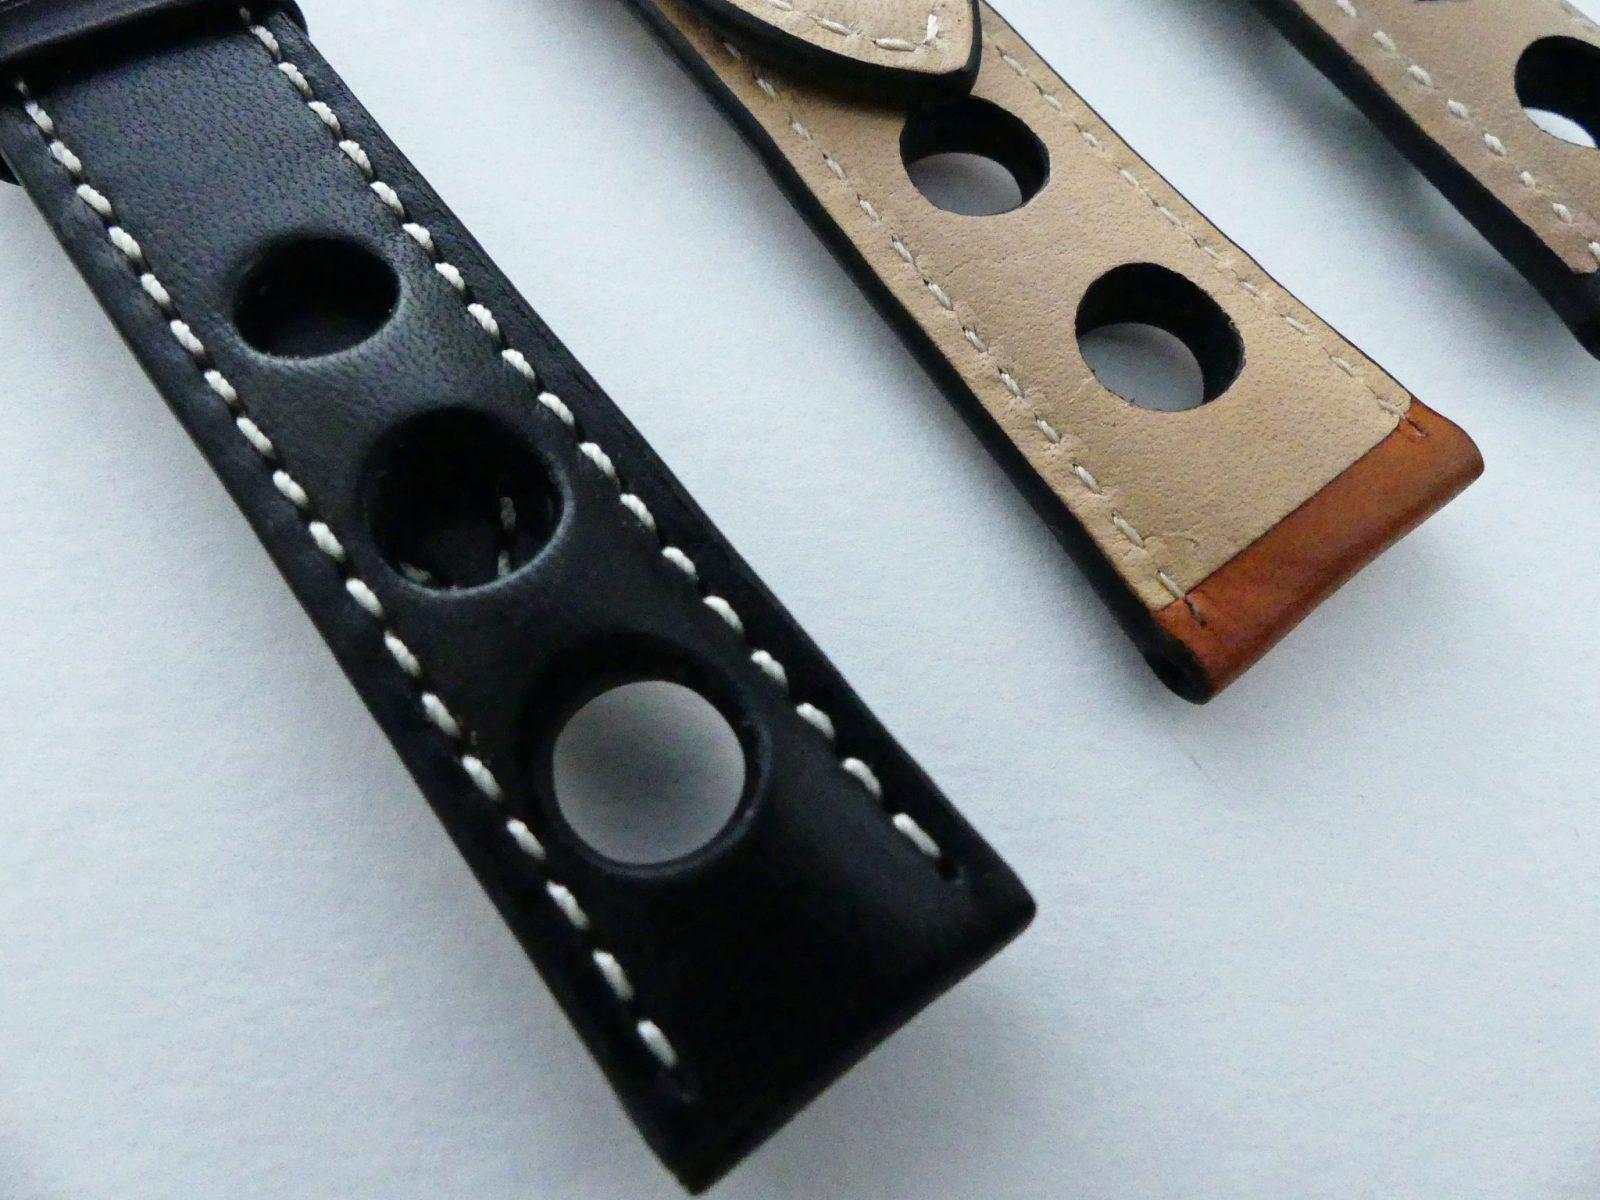 Modell-1-Leder-schwarz-o.-braun-18-19-20-22mm-80,00-Euro_3